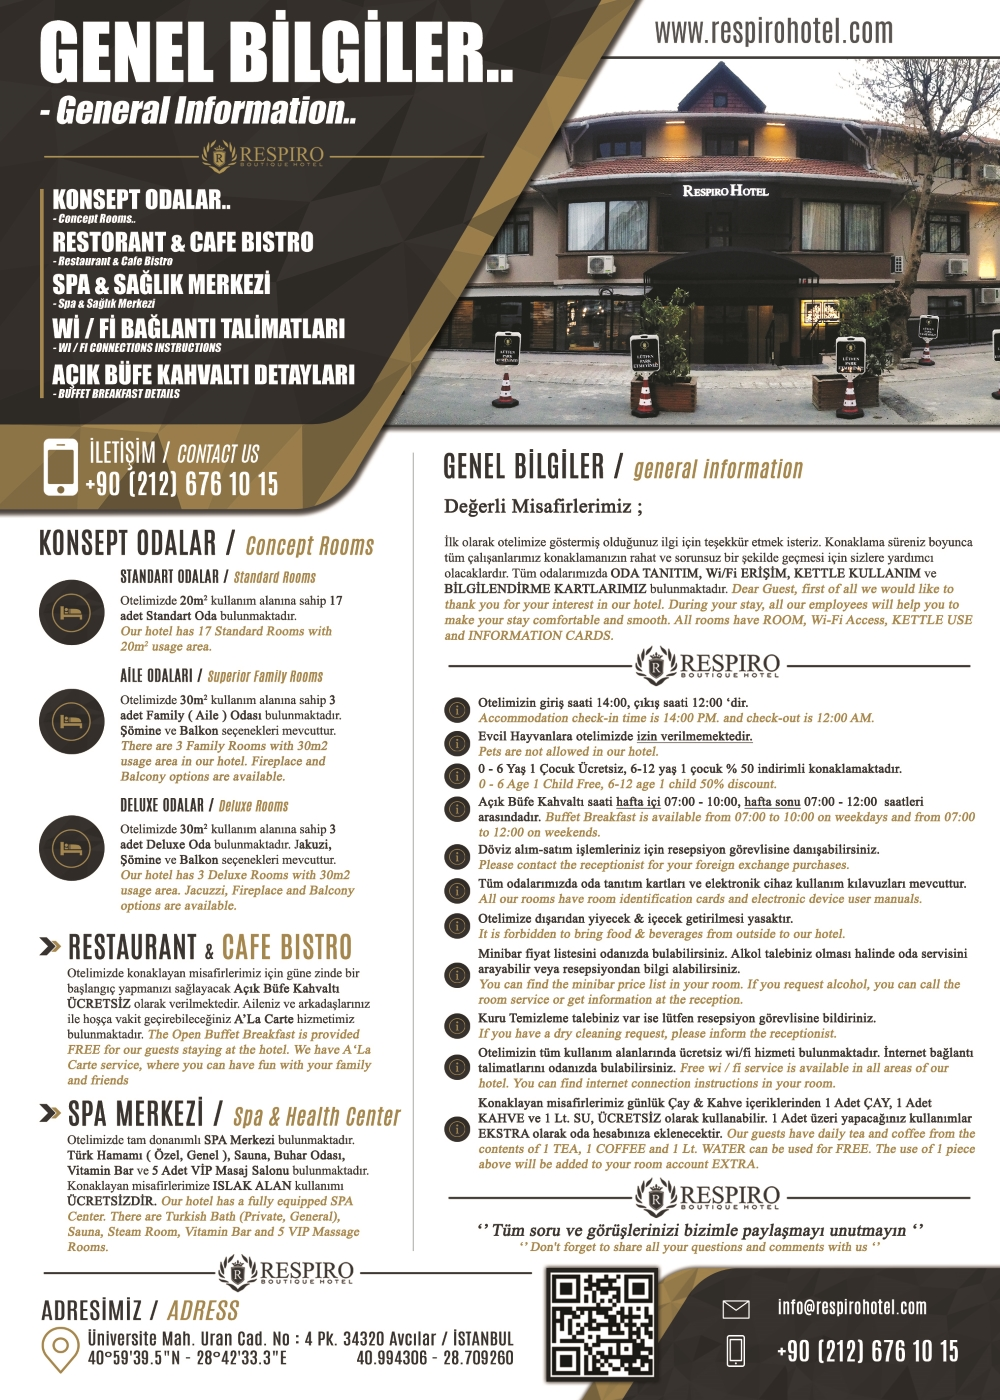 Respiro Boutique Hotel Factsheet Genel Bilgiler